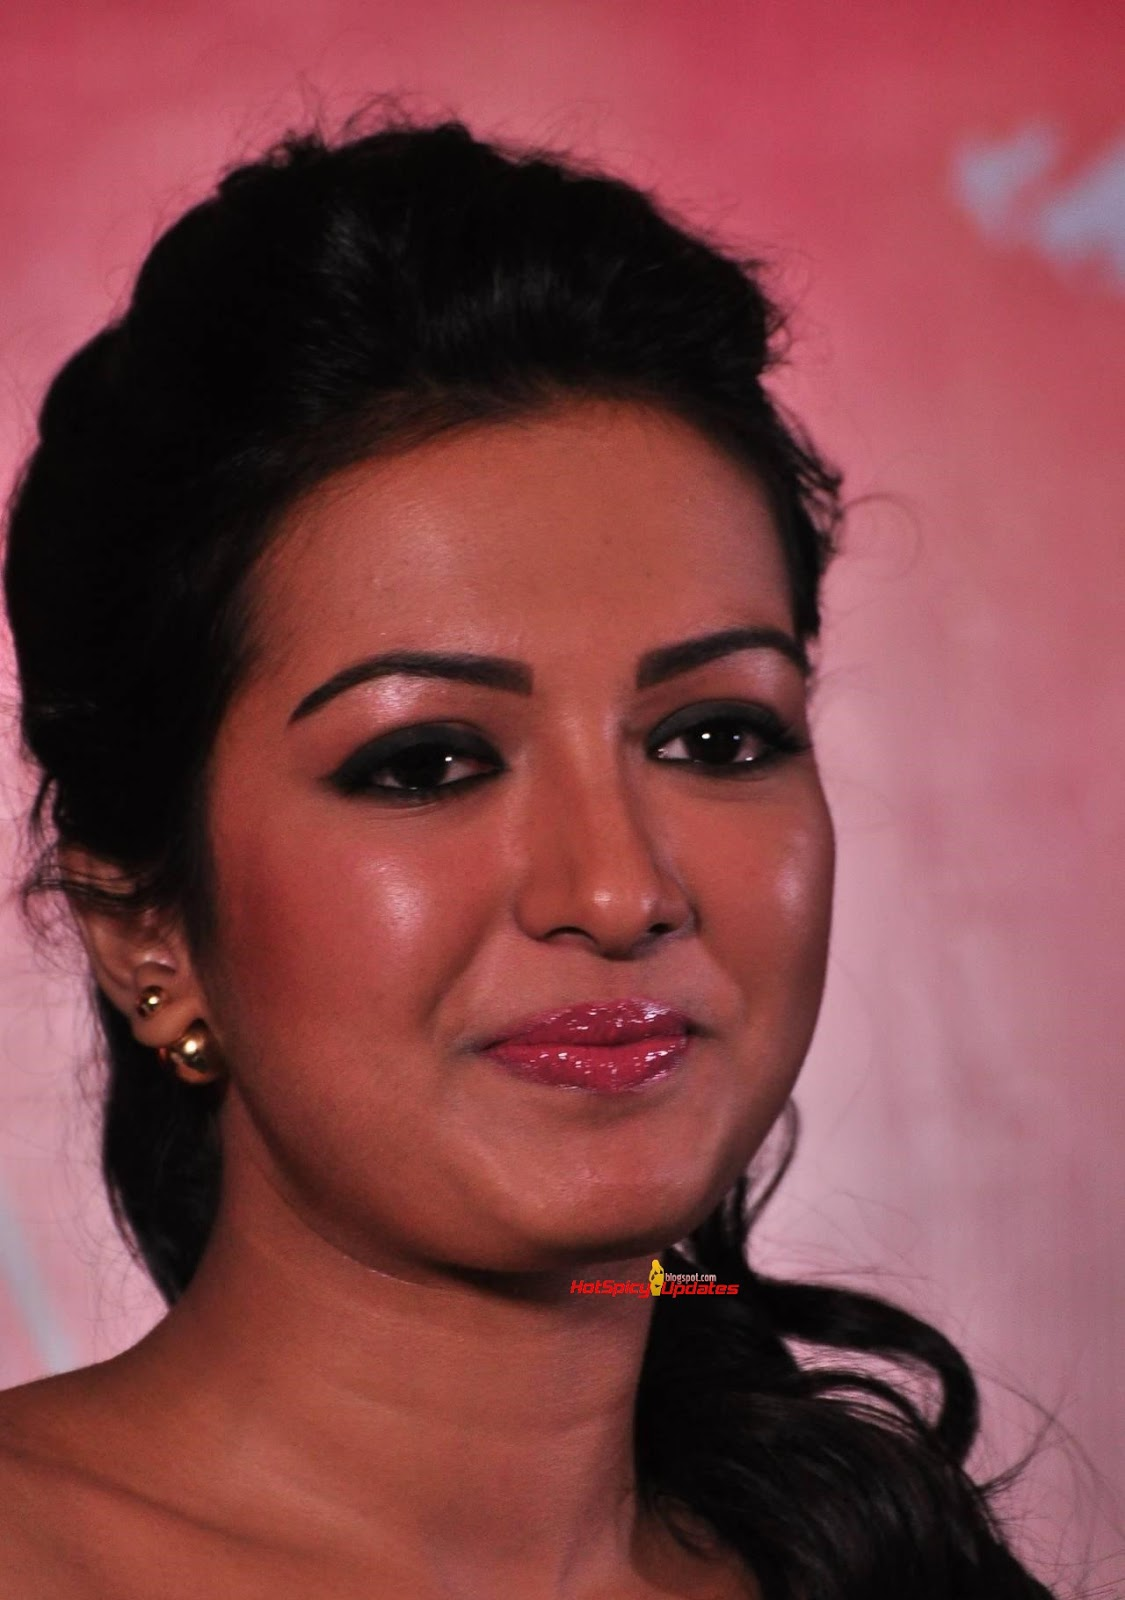 catherine tresa at kalavathi movie press meet stills latest high quality images of actresses